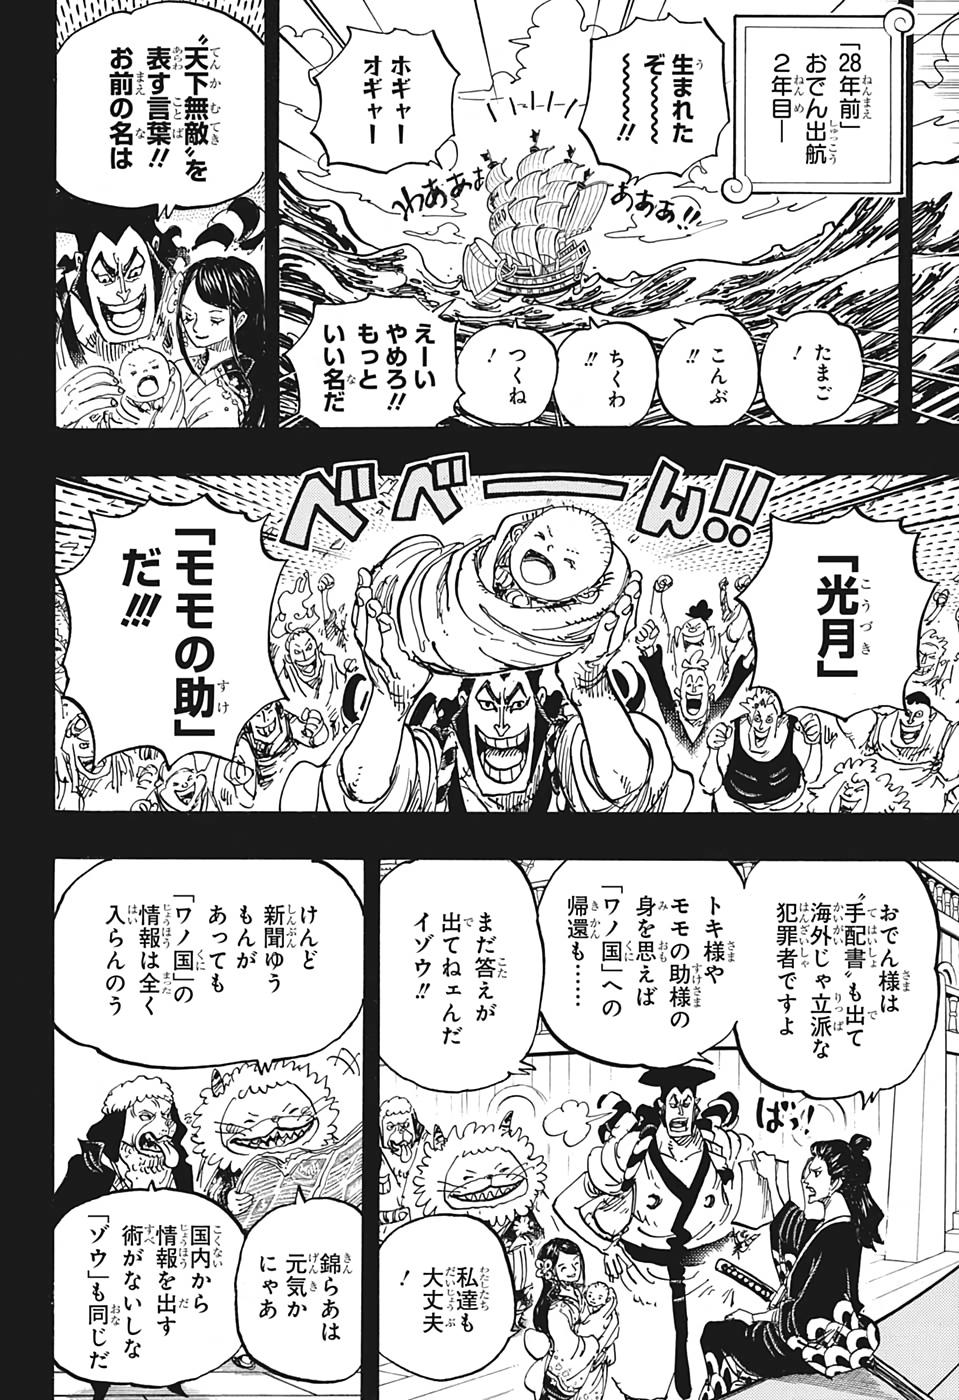 Spoiler One Piece 965 : spoiler, piece, 人気のファッショントレンド:, 綺麗なOne, Piece, Manga